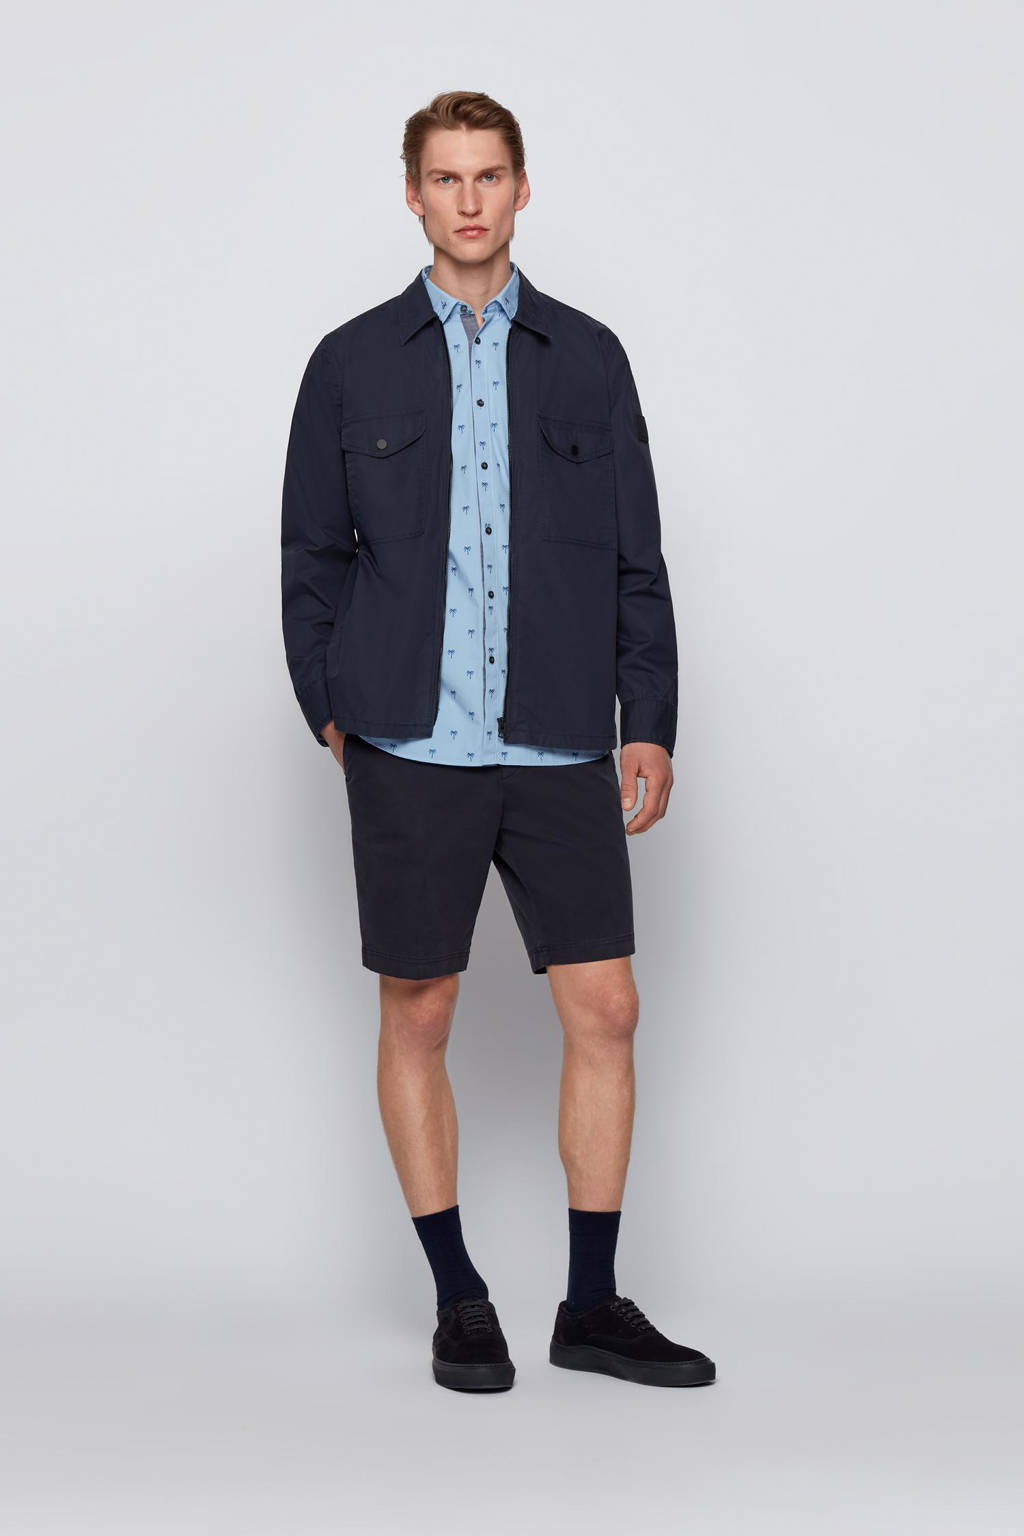 BOSS Casual slim fit overhemd Magneton met all over print lichtblauw, Lichtblauw